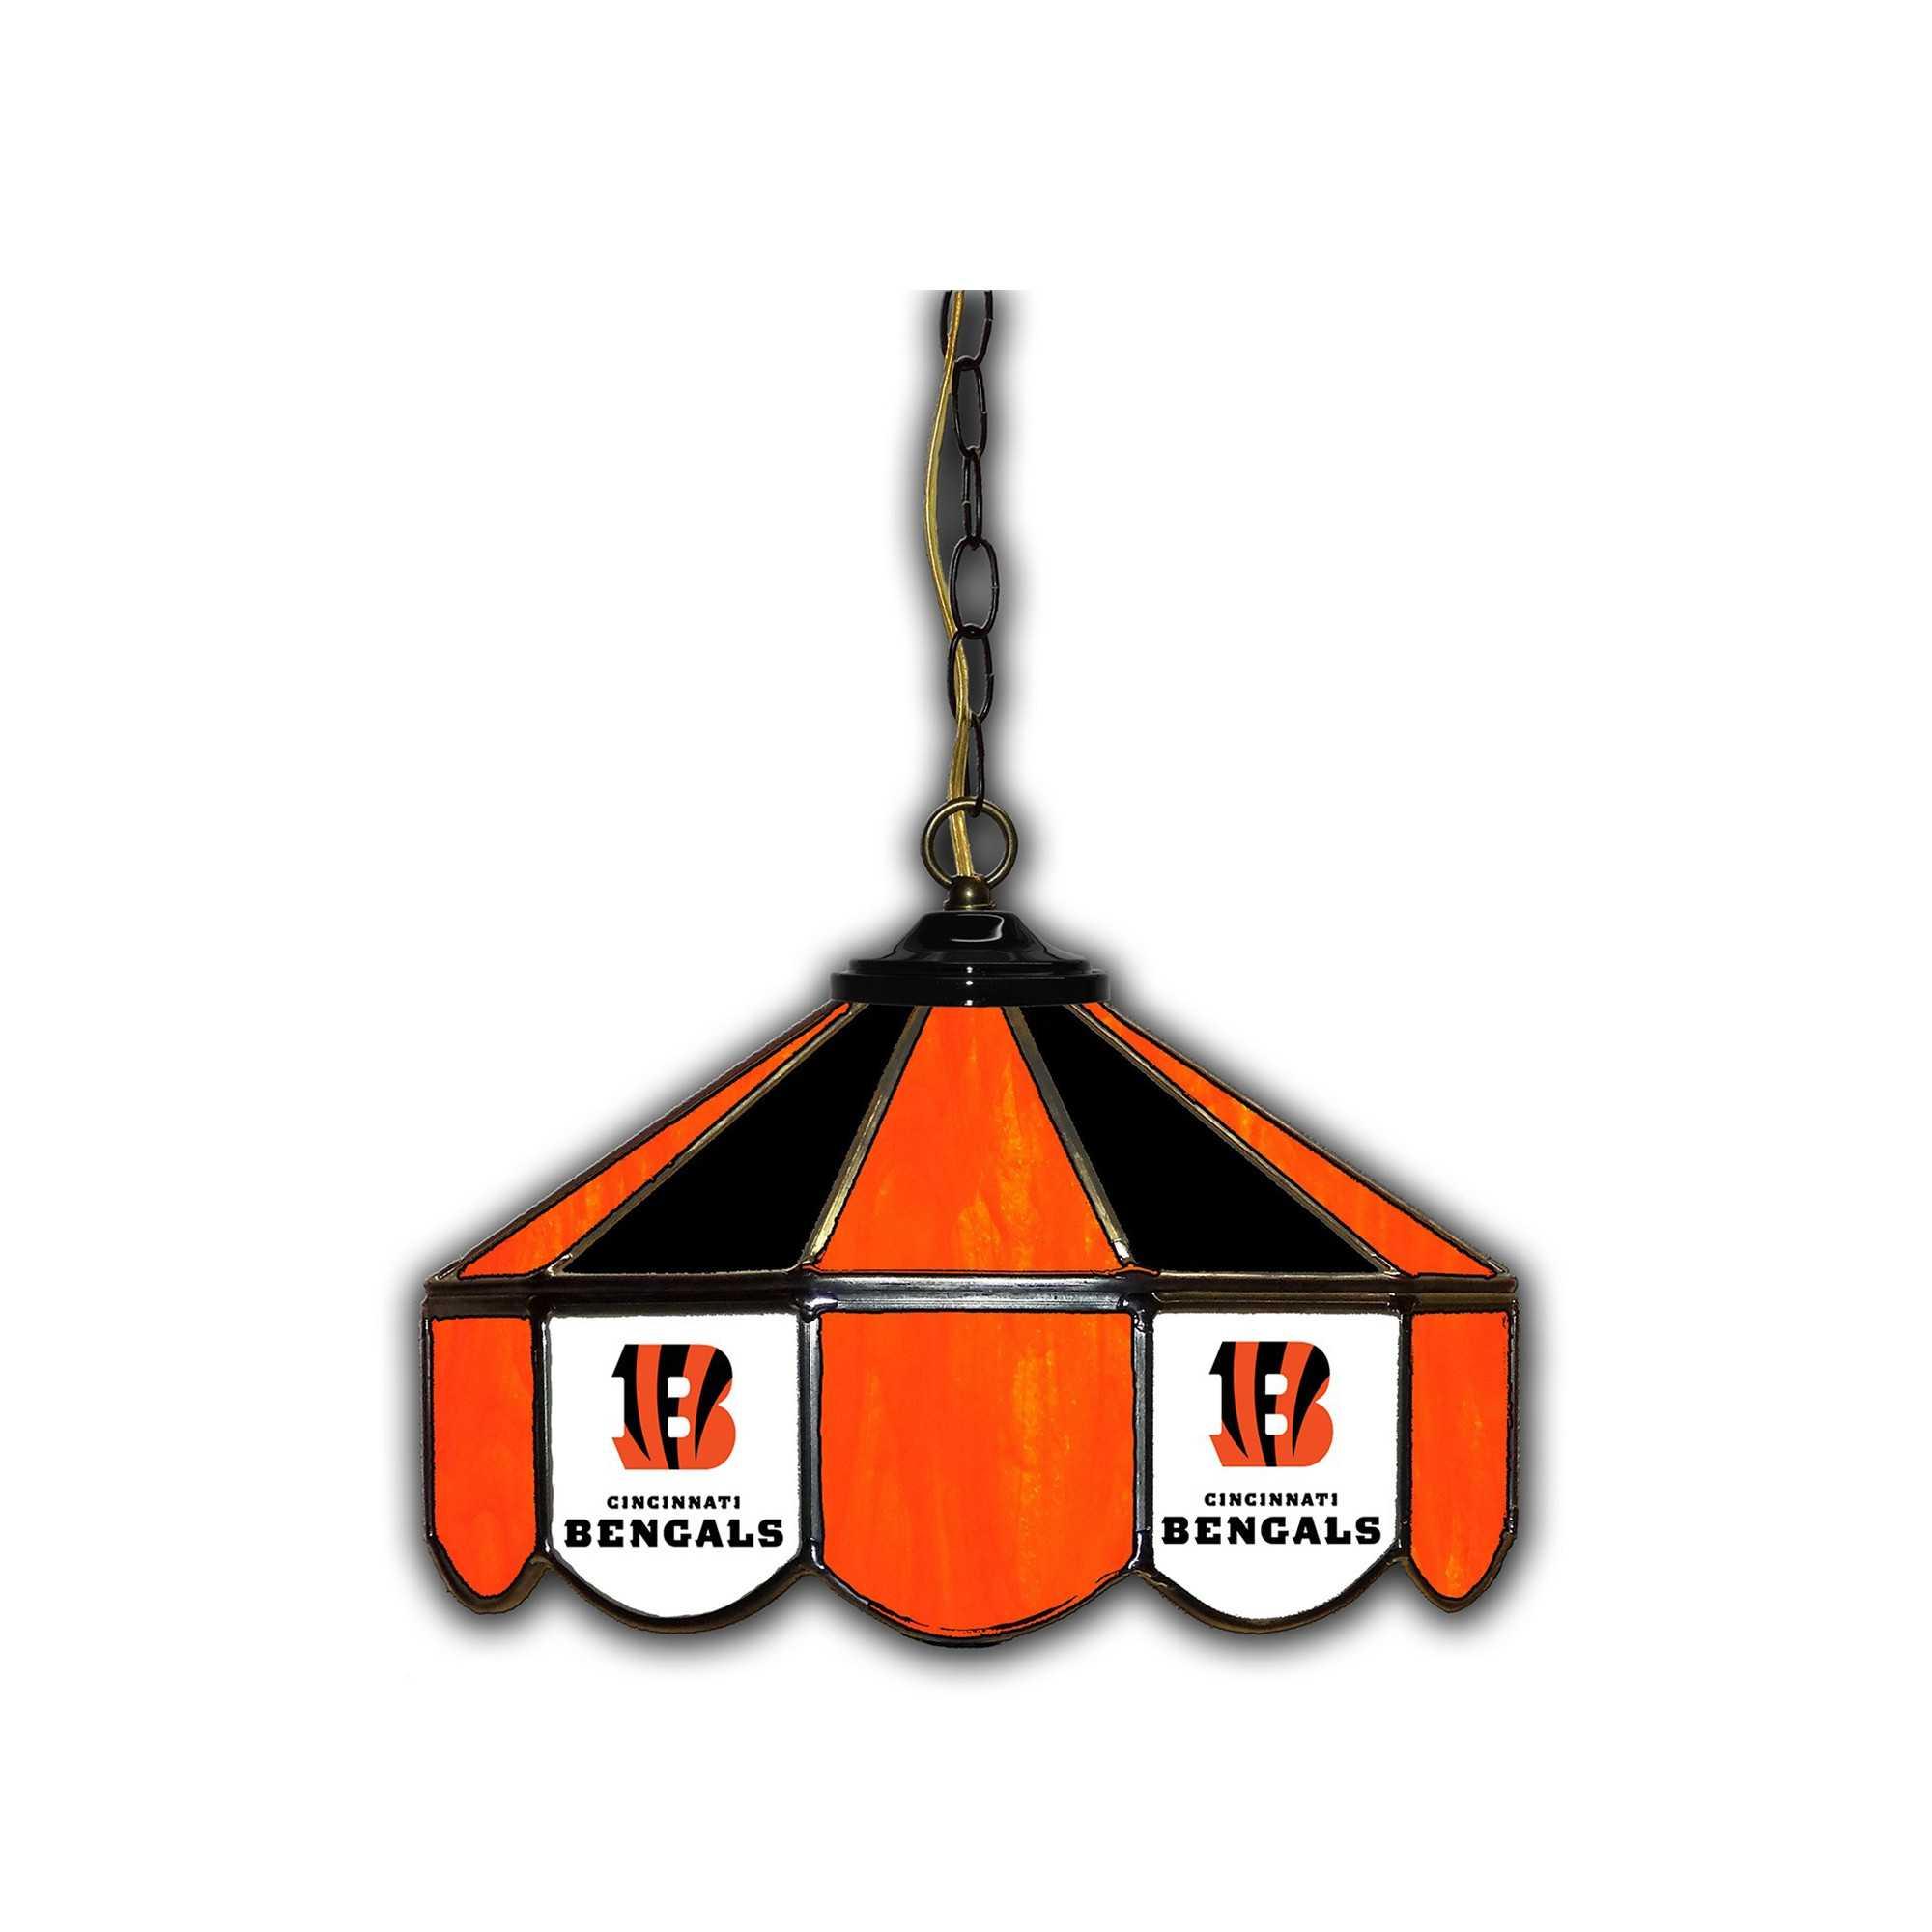 "CINCINNATI BENGALS 14"" GLASS PUB LAMP"